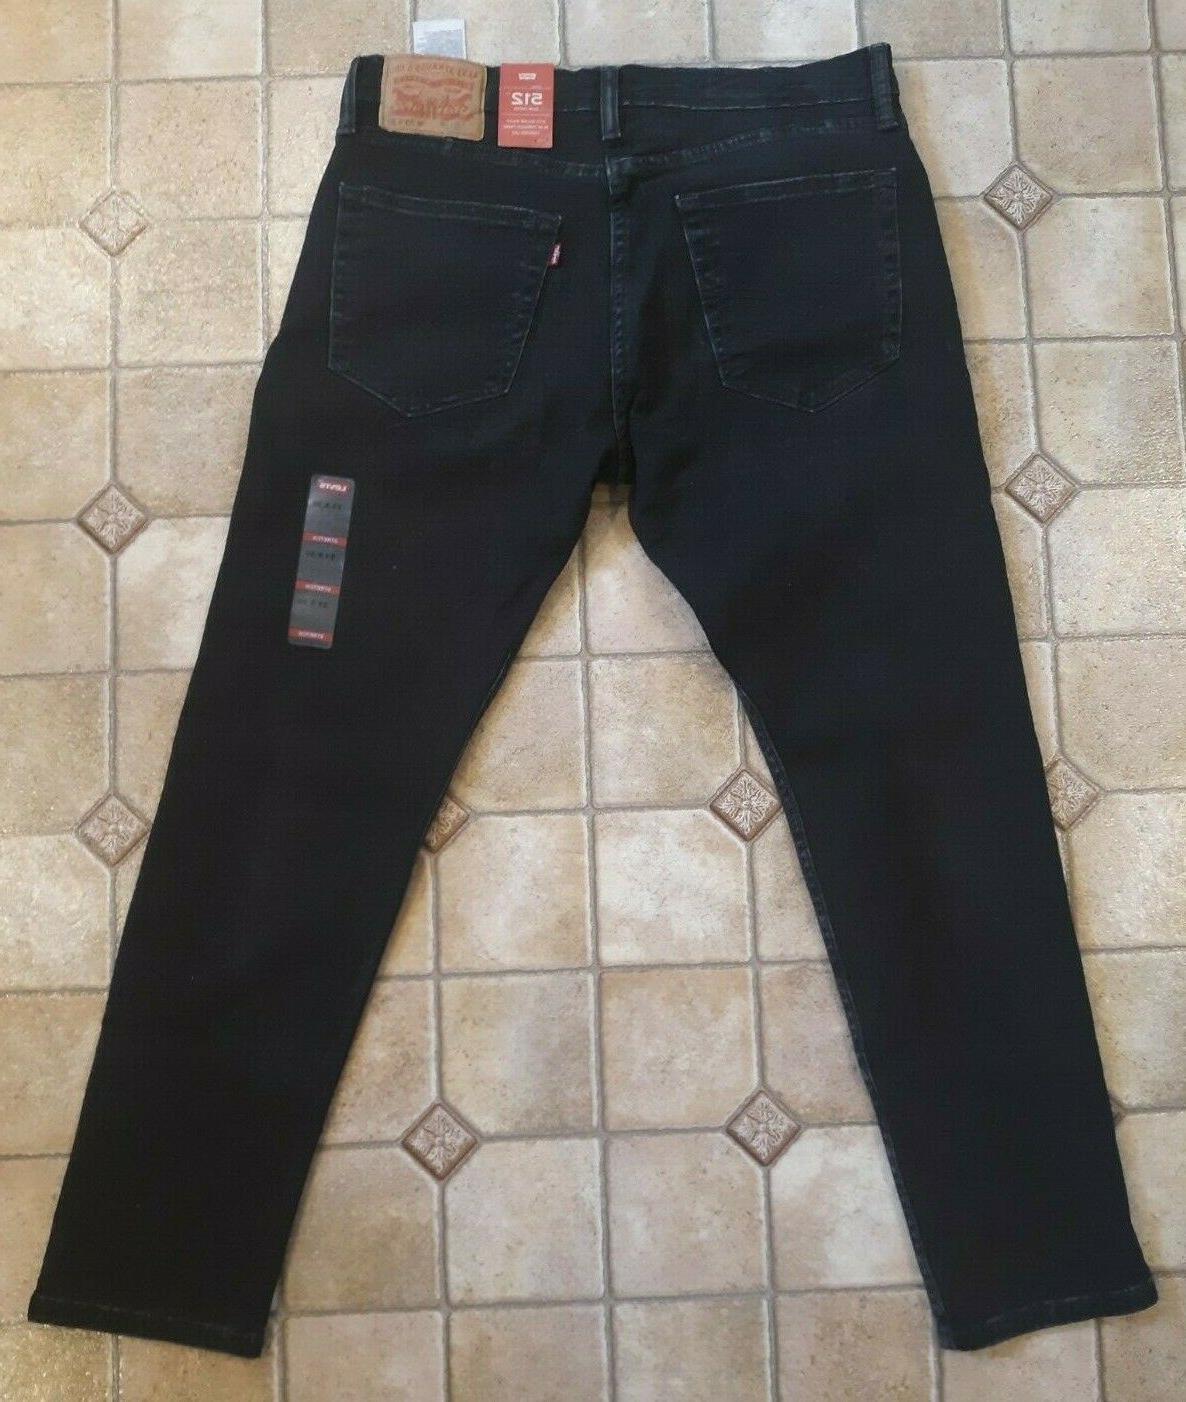 NWT Jeans Men's 512 Slim Taper x